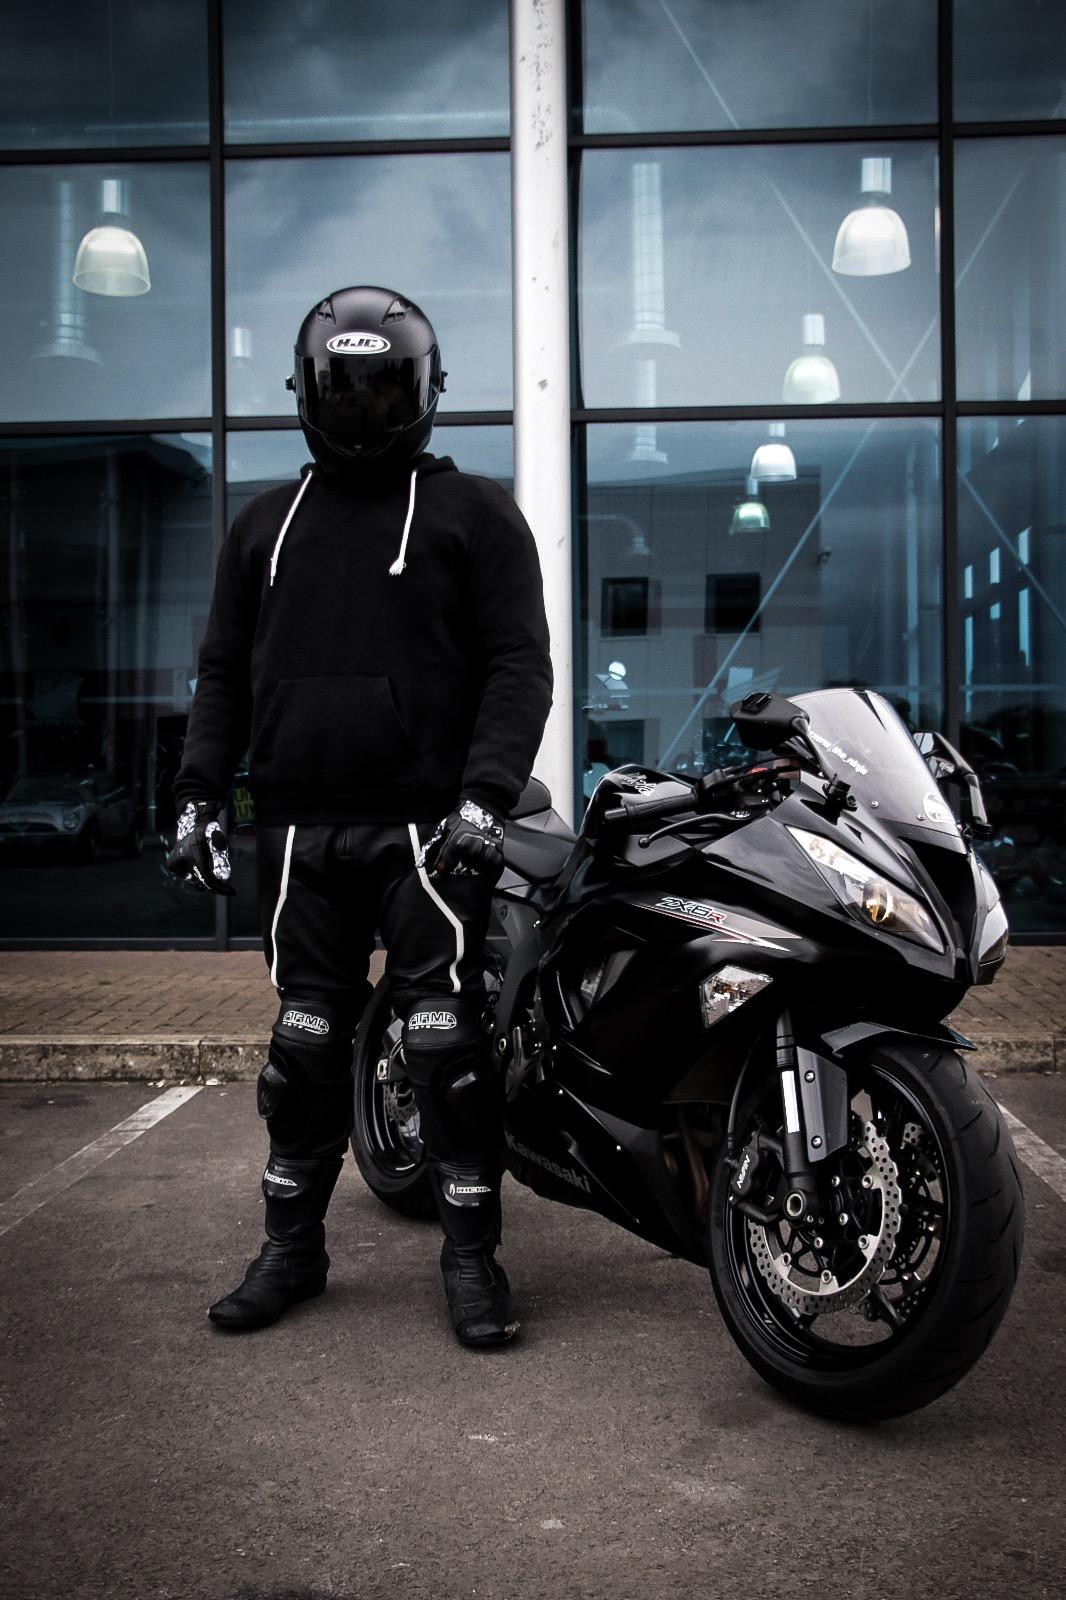 zxena_the_ninja4